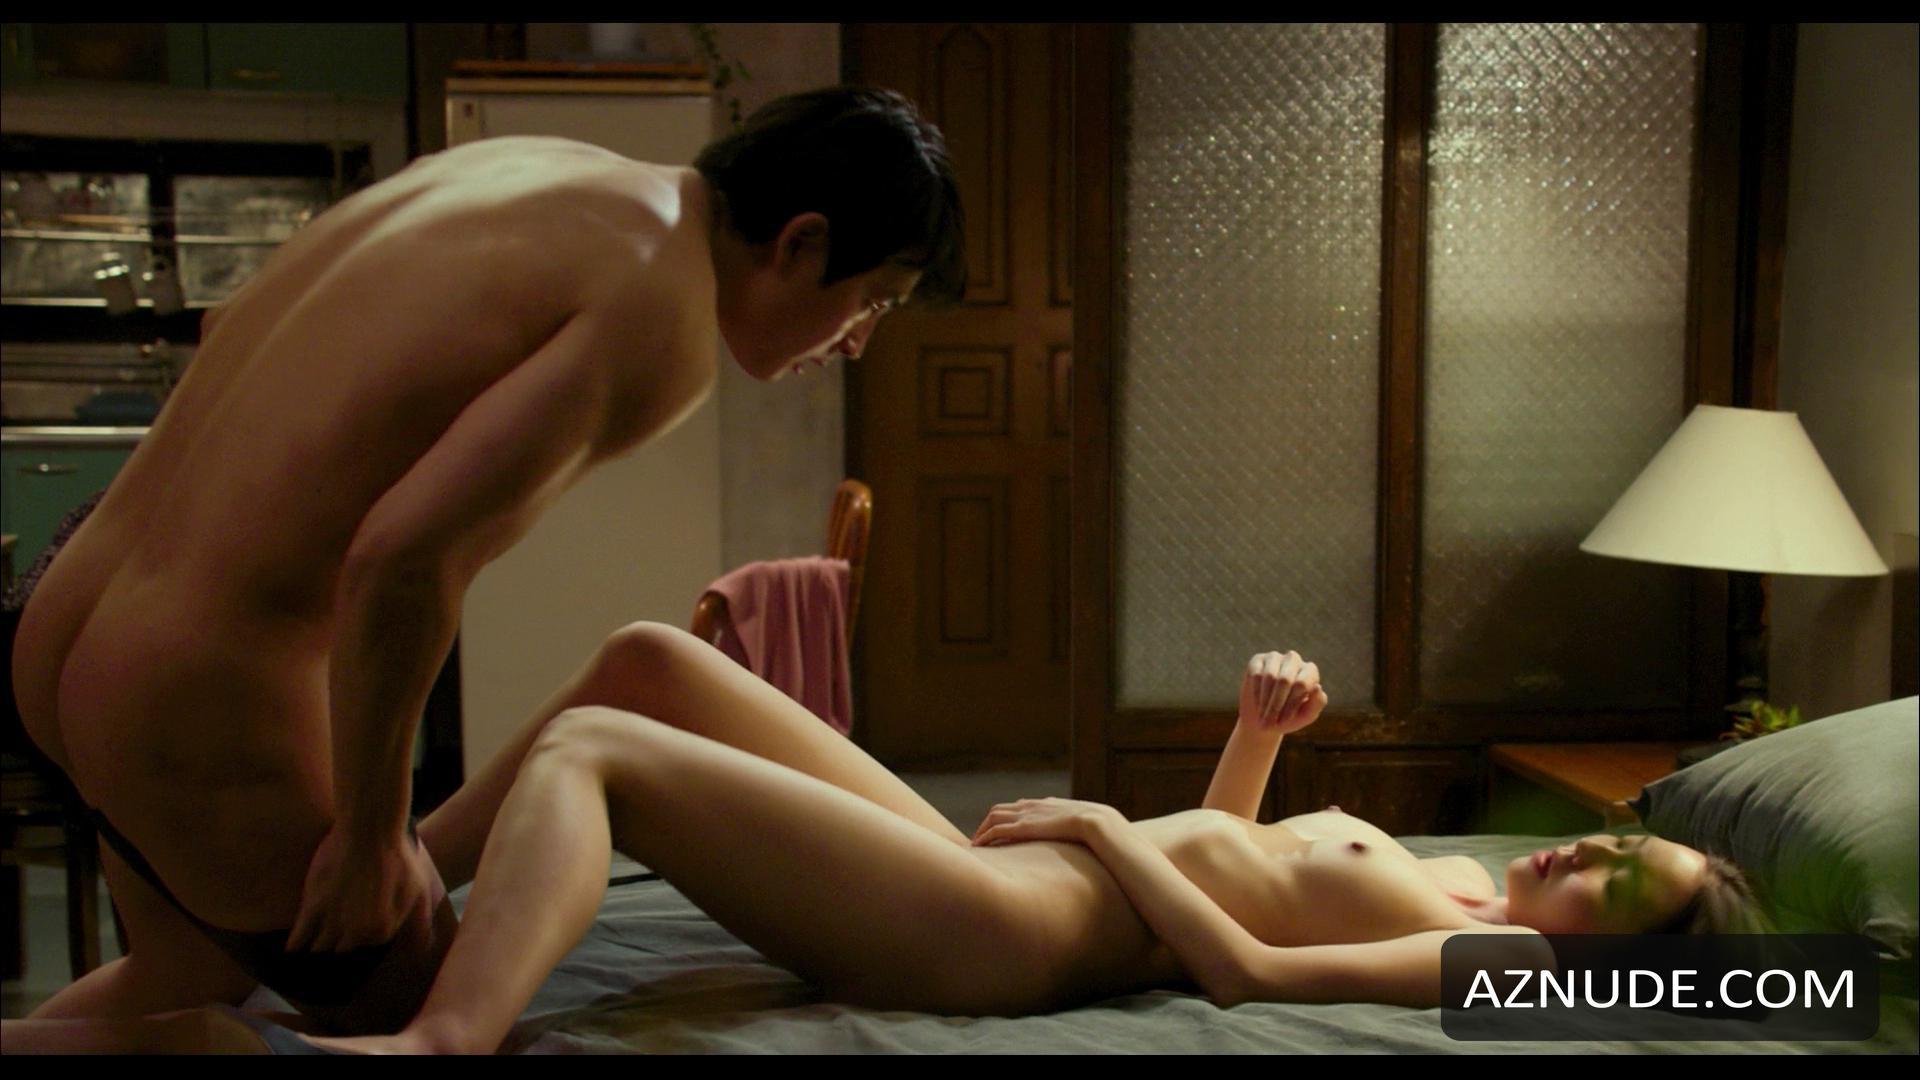 Scarlet Innocence Nude Scenes - Aznude Men-1272